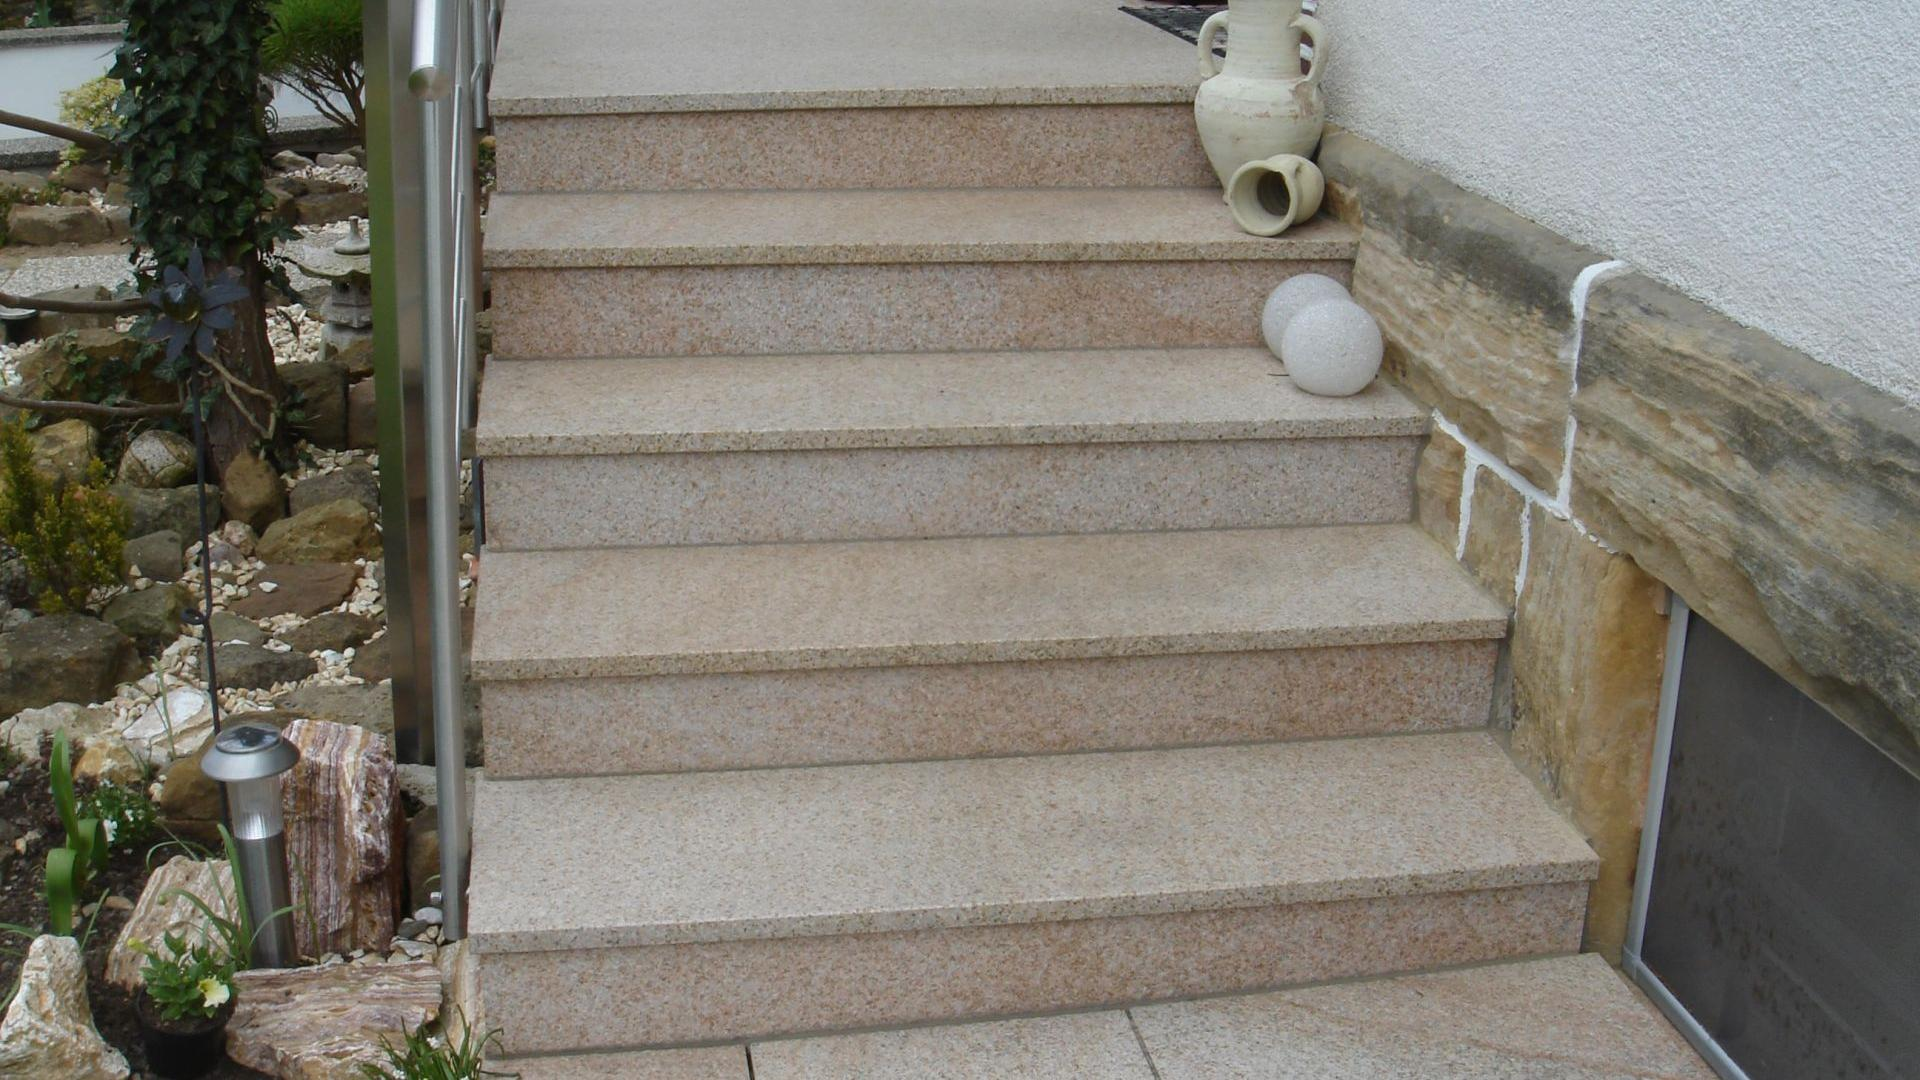 au entreppe aus granit beton naturstein waschbeton wagner treppenbau mainleus. Black Bedroom Furniture Sets. Home Design Ideas